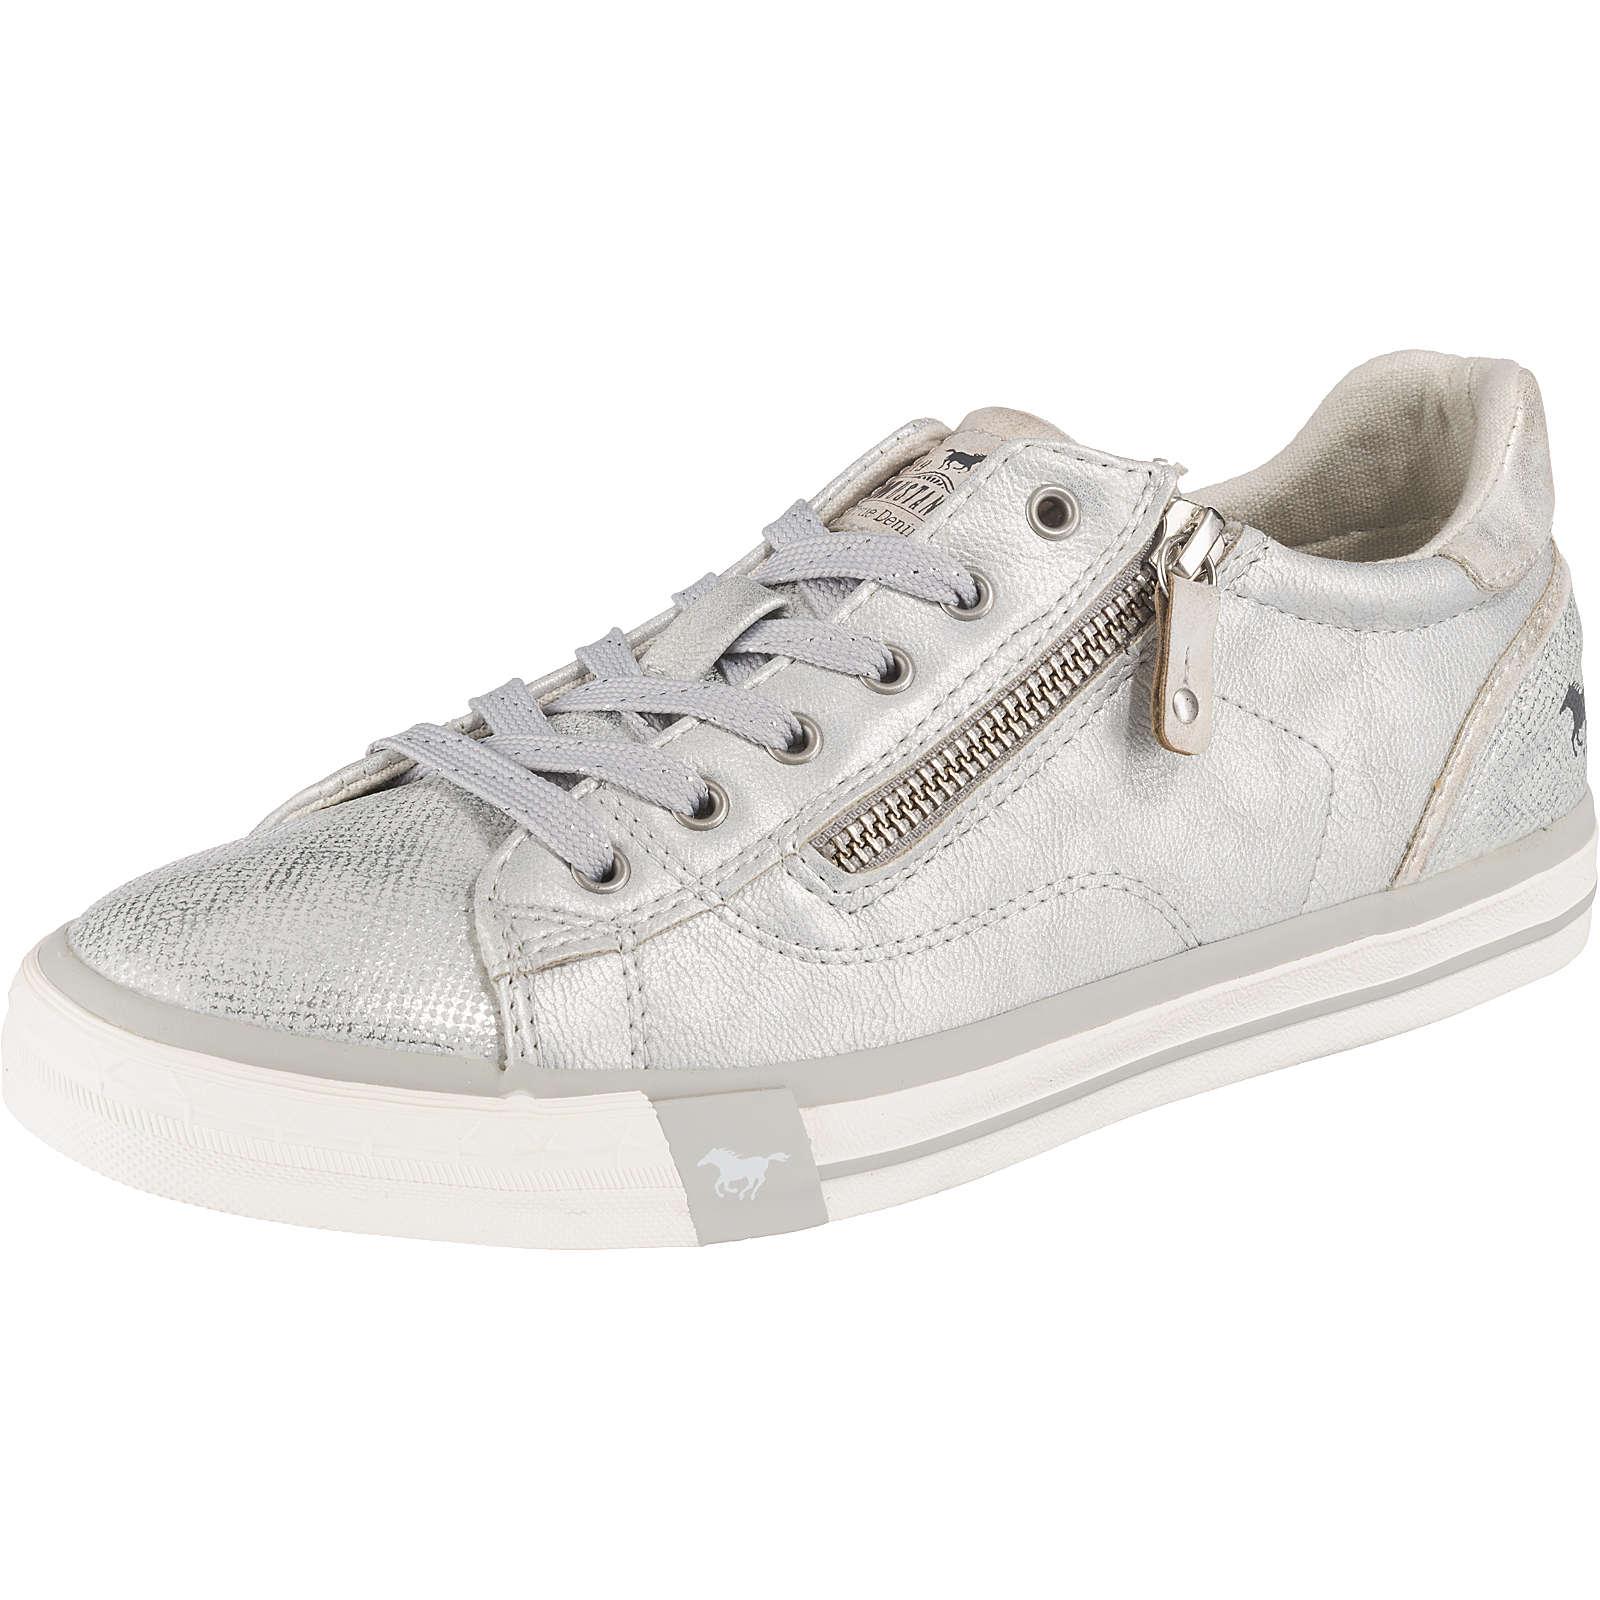 MUSTANG Sneakers Low silber Damen Gr. 43